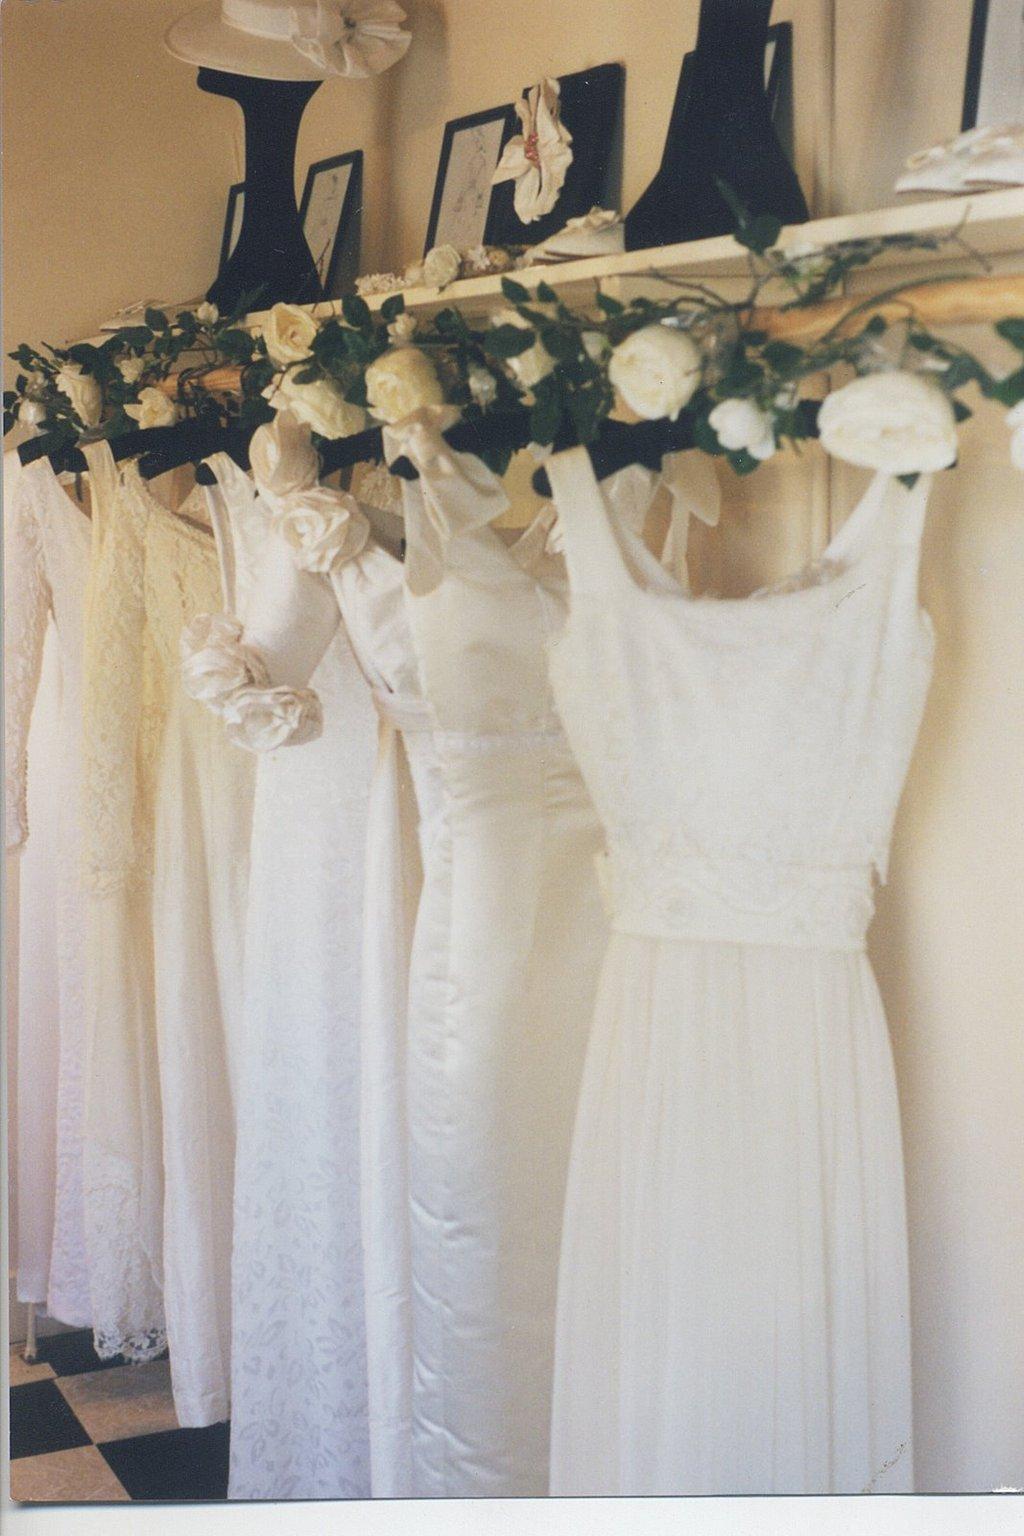 Amy-jo-tatum-bridal-couture-wedding-dresses-hang-on-rack-lace-applique.full